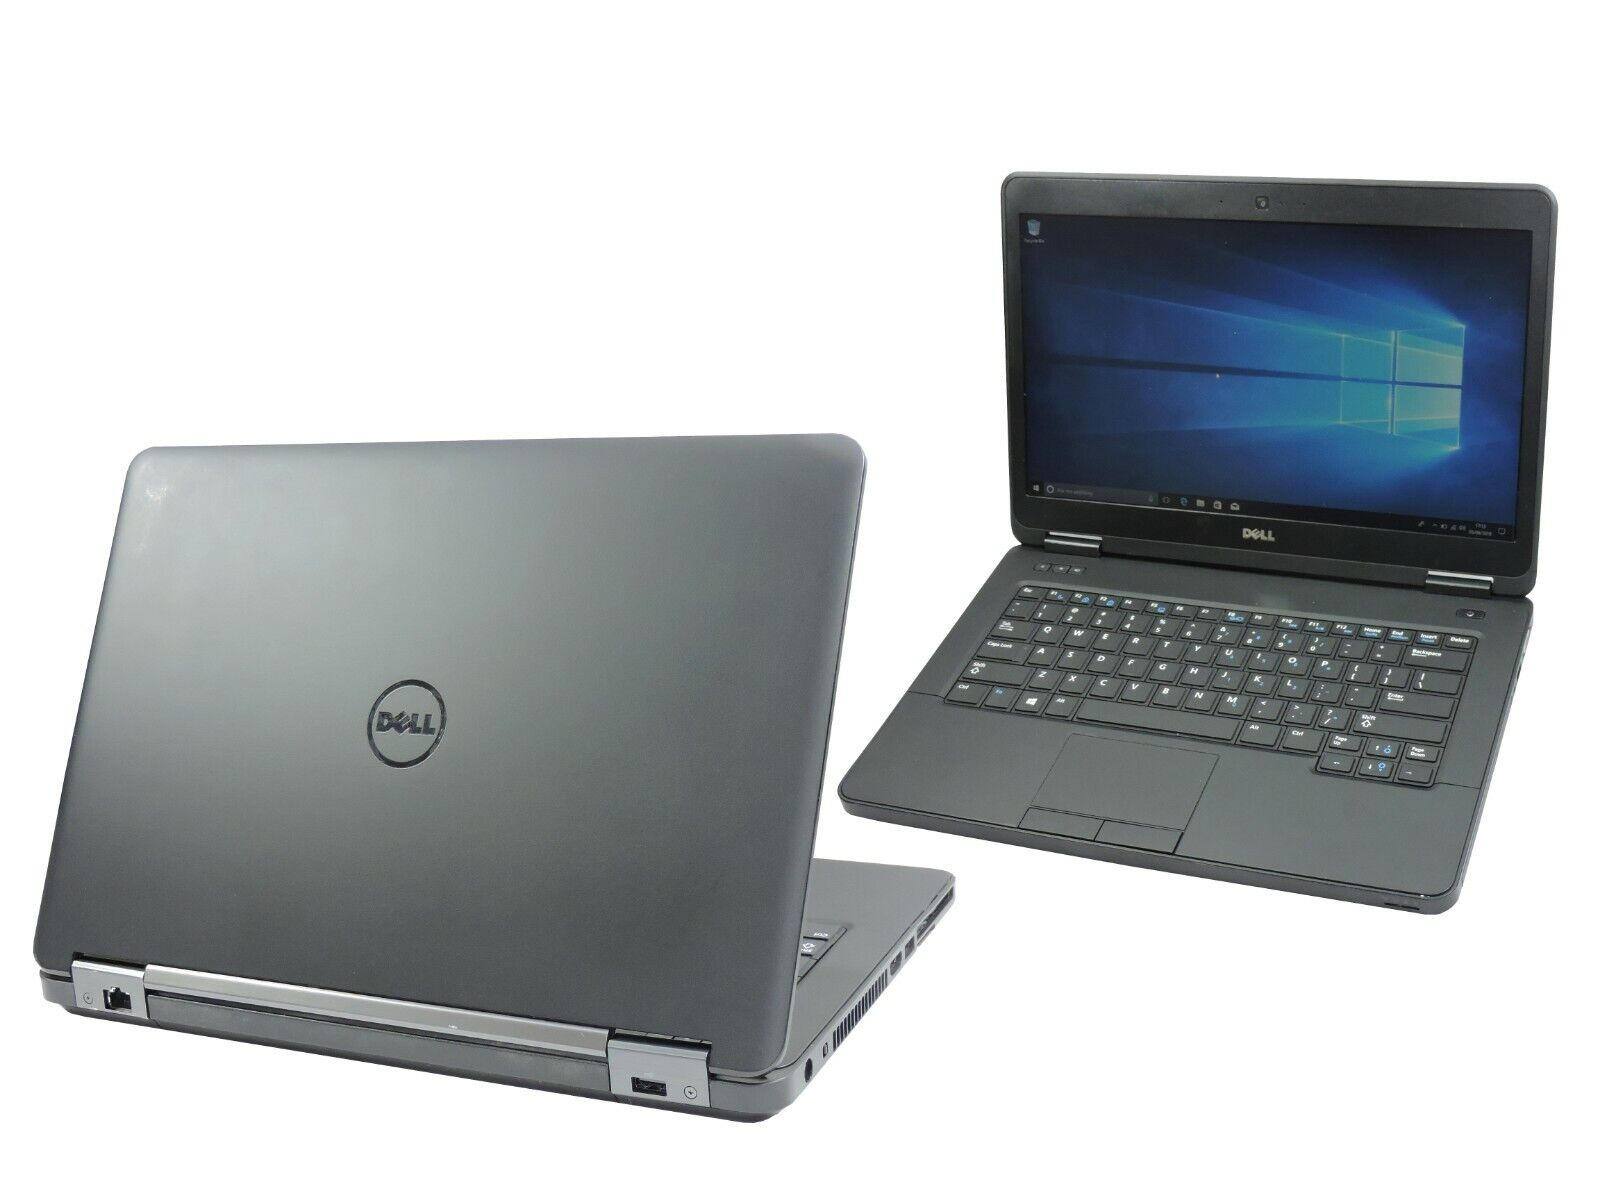 Laptop Windows - Dell Laptop Windows 10 Latitude E5440 i3-4010u 1.70GHz 4GB 500GB HDD Webcam HDMI